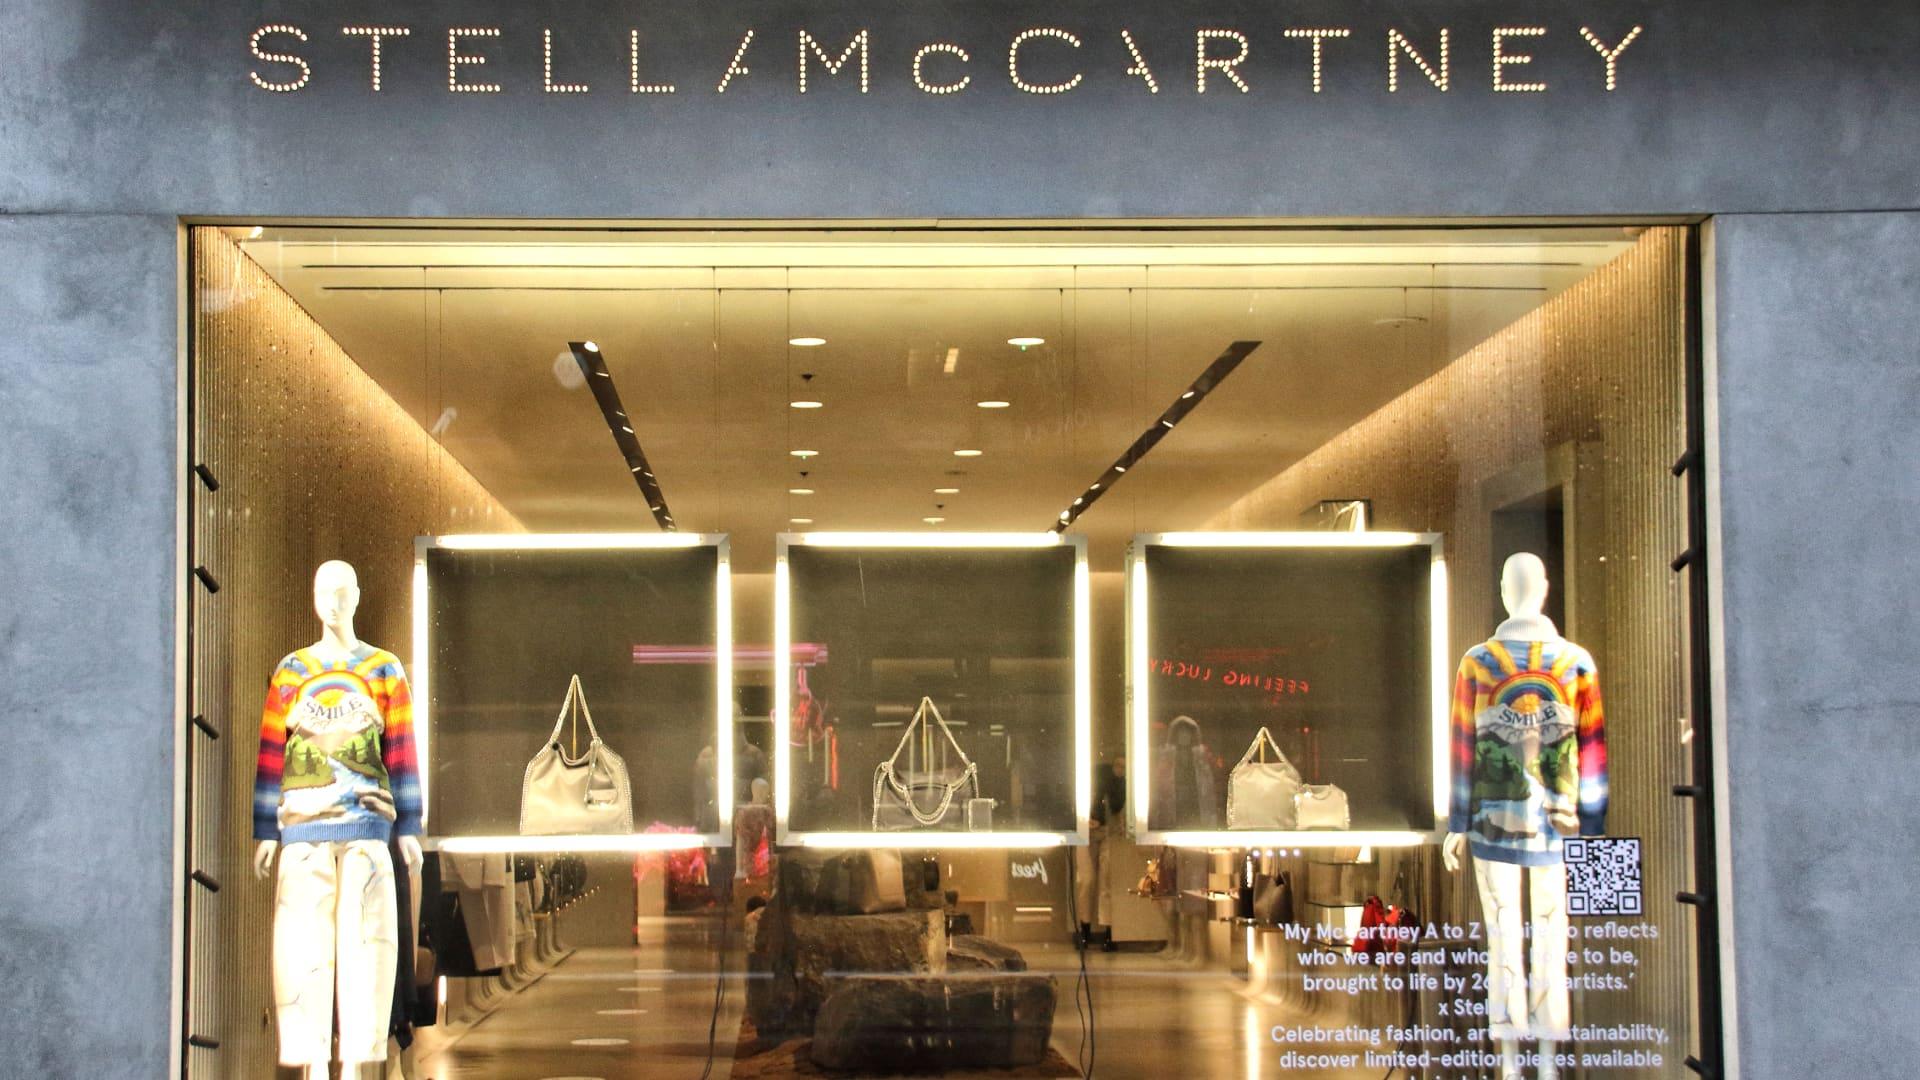 Stella McCartney store in Bond Street in November 2020.